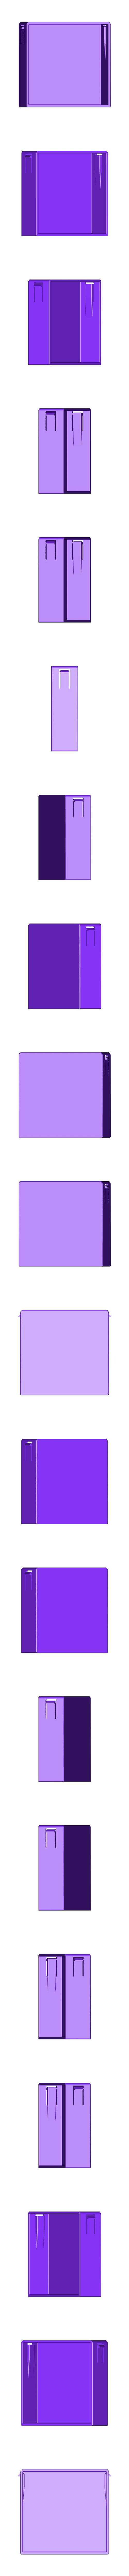 Small Drawer.STL Download STL file Ender 3 Pro Storage Mod Kit • Object to 3D print, a3rdDimension